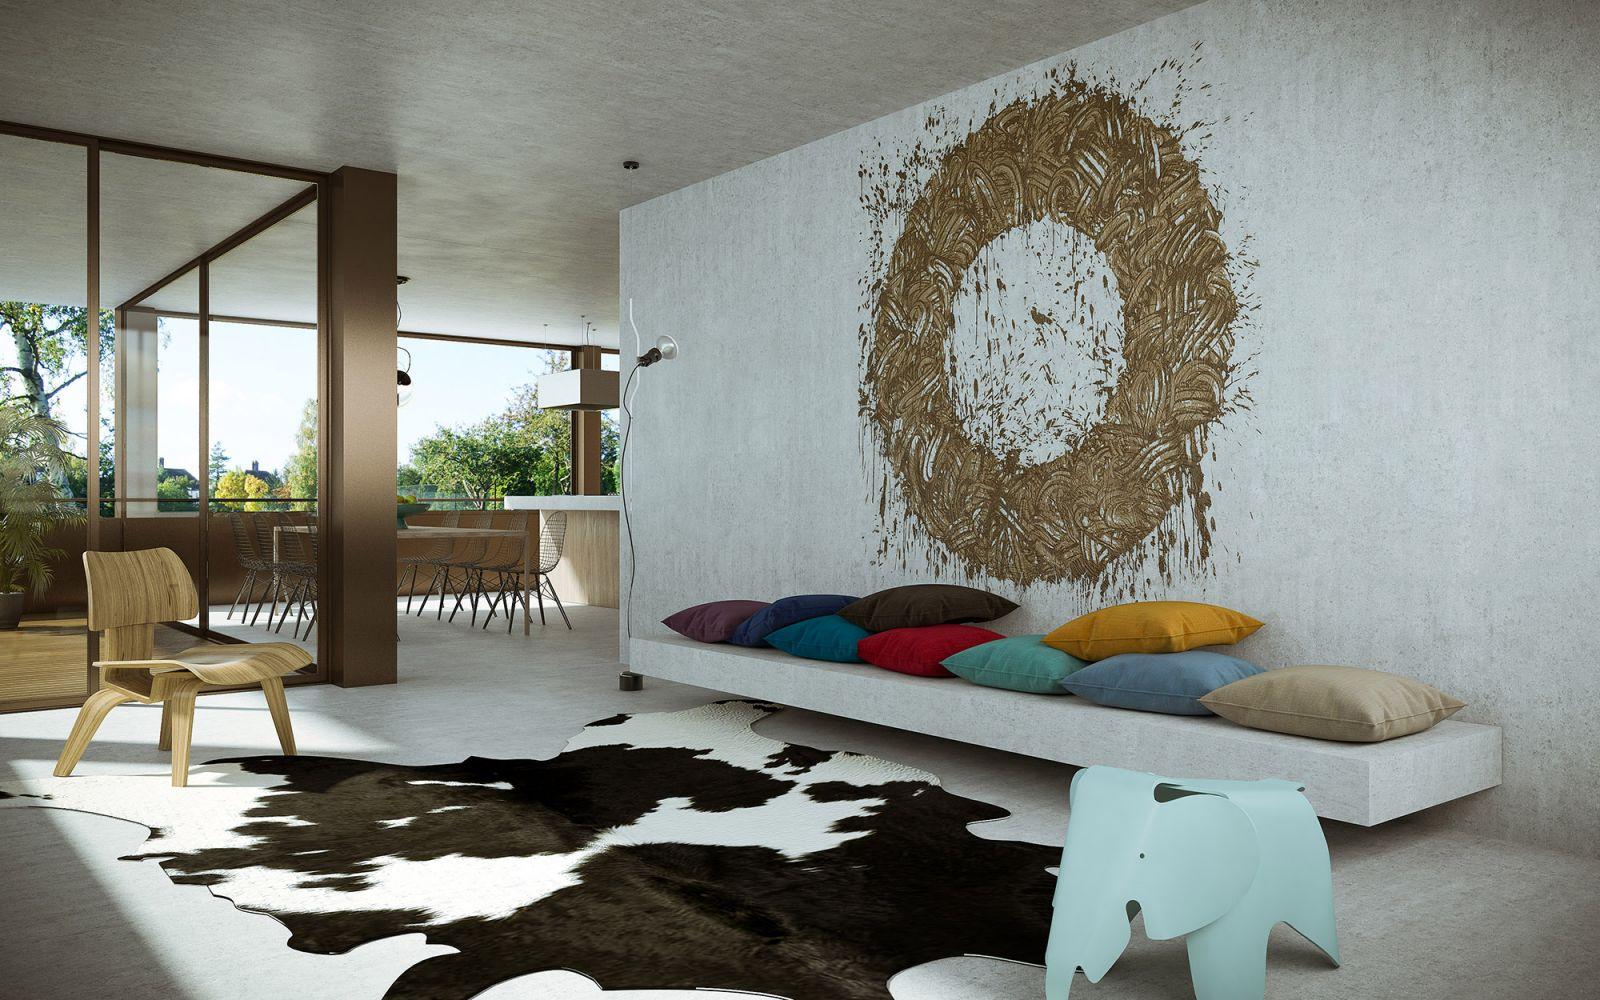 Le Vallon de Villars - Apartments 242